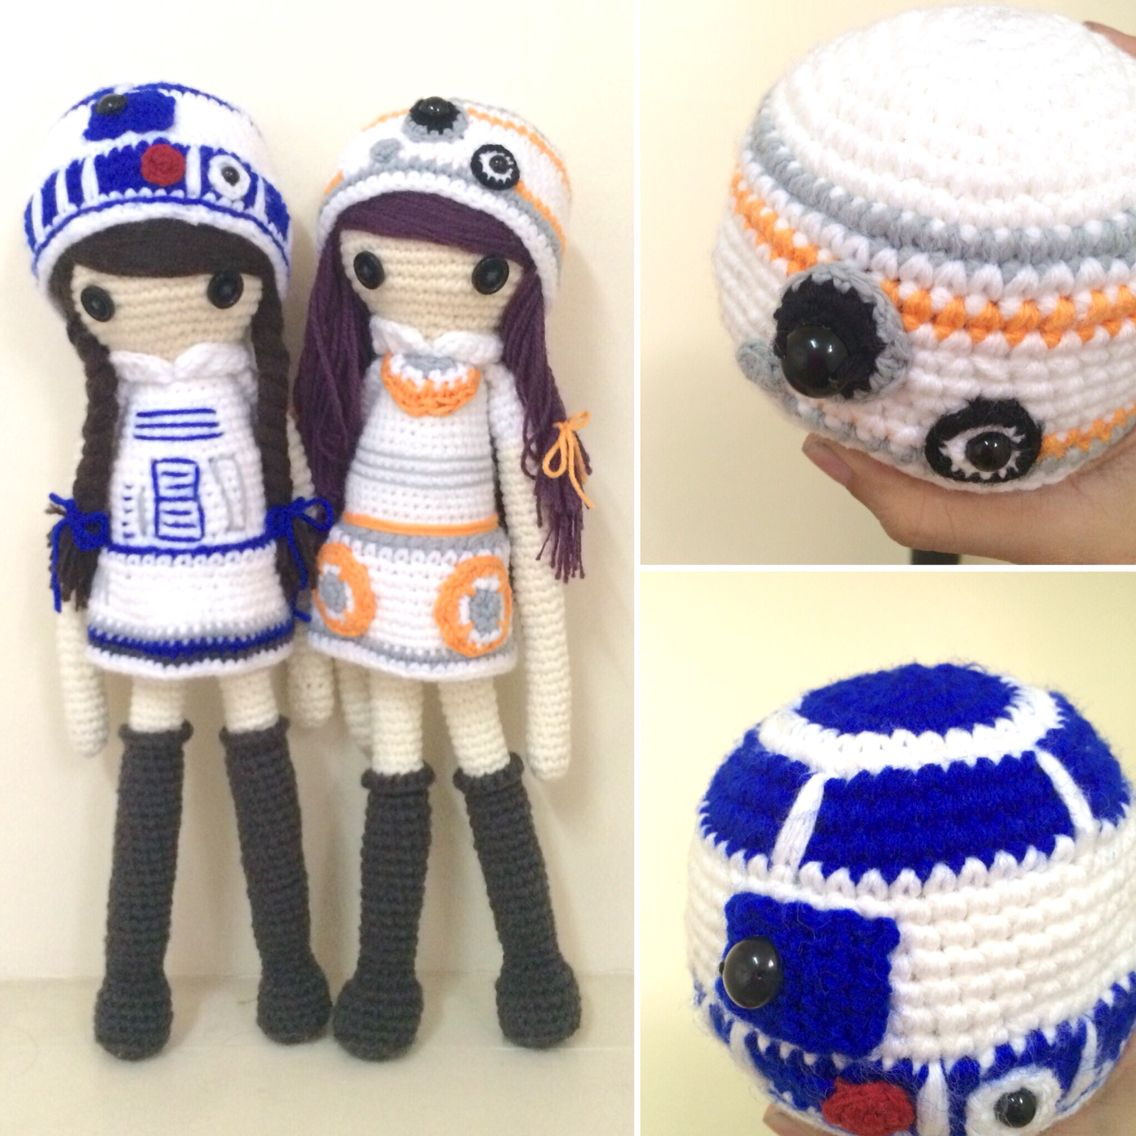 Star Wars R2D2 crocheted art dolls | Star wars stuuff | Pinterest ...